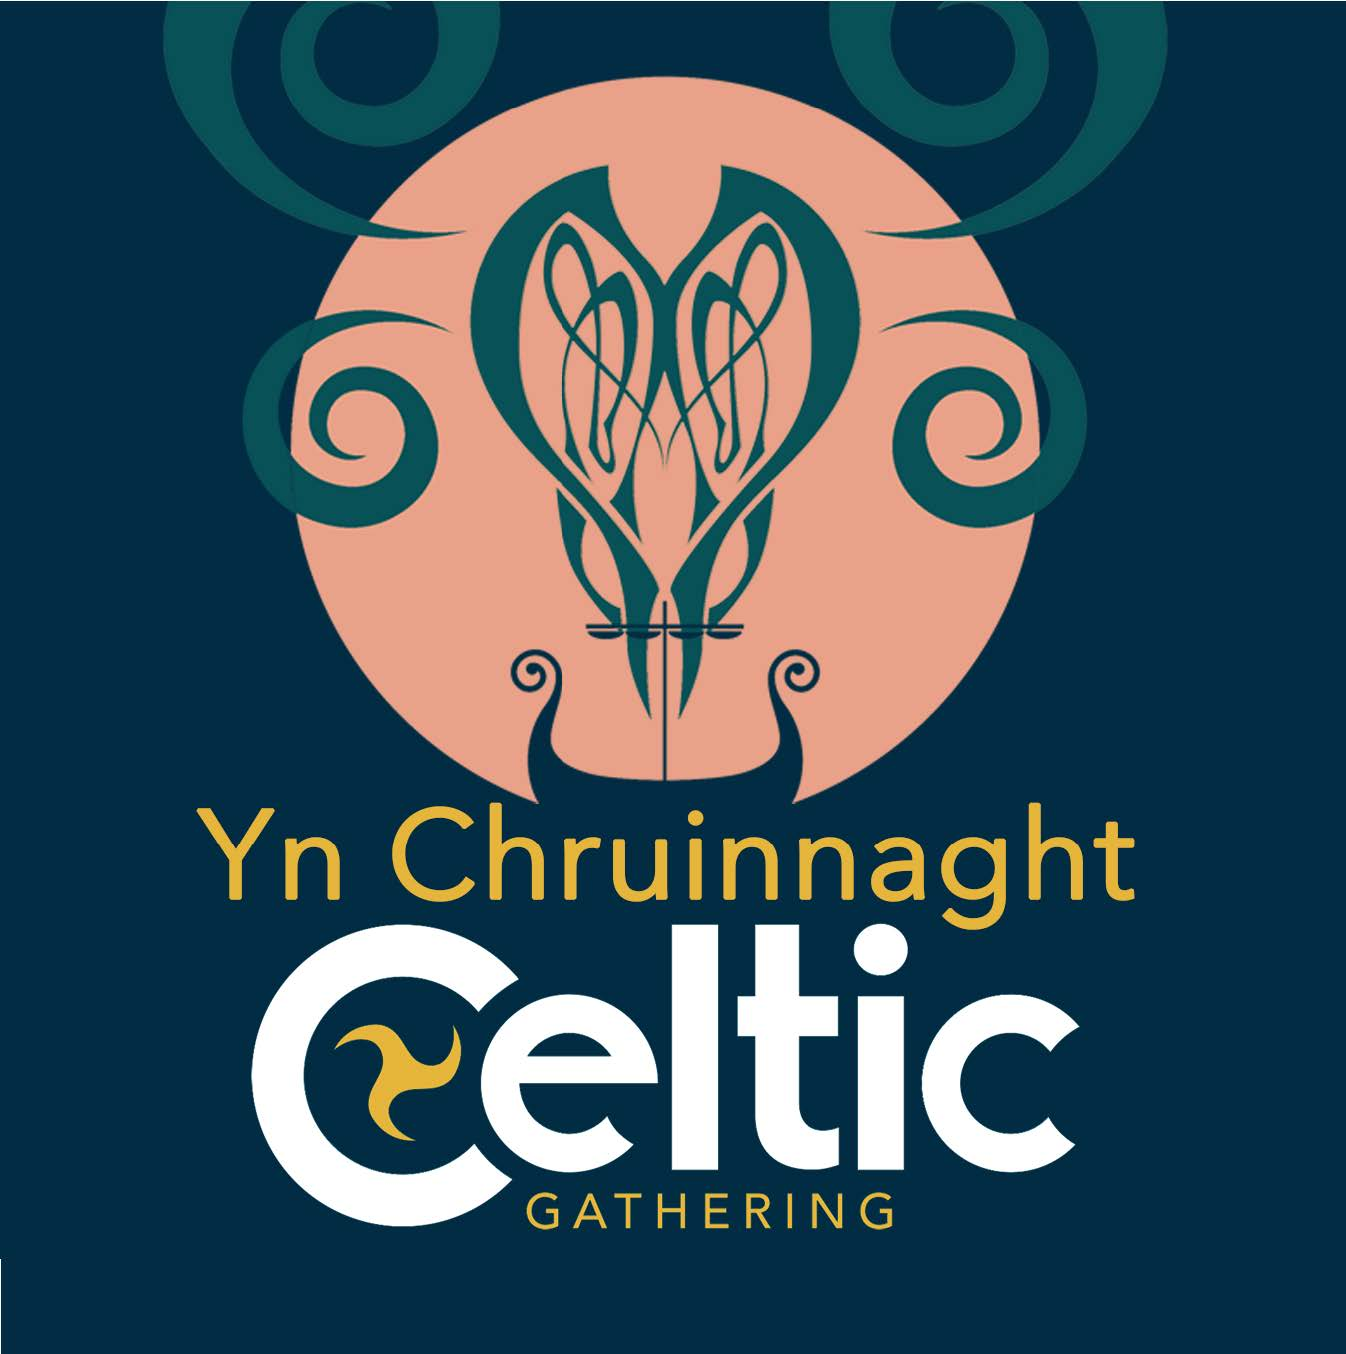 Yn Chruinnaght Celtic Gathering 'Manx Night' @ Centenary Centre